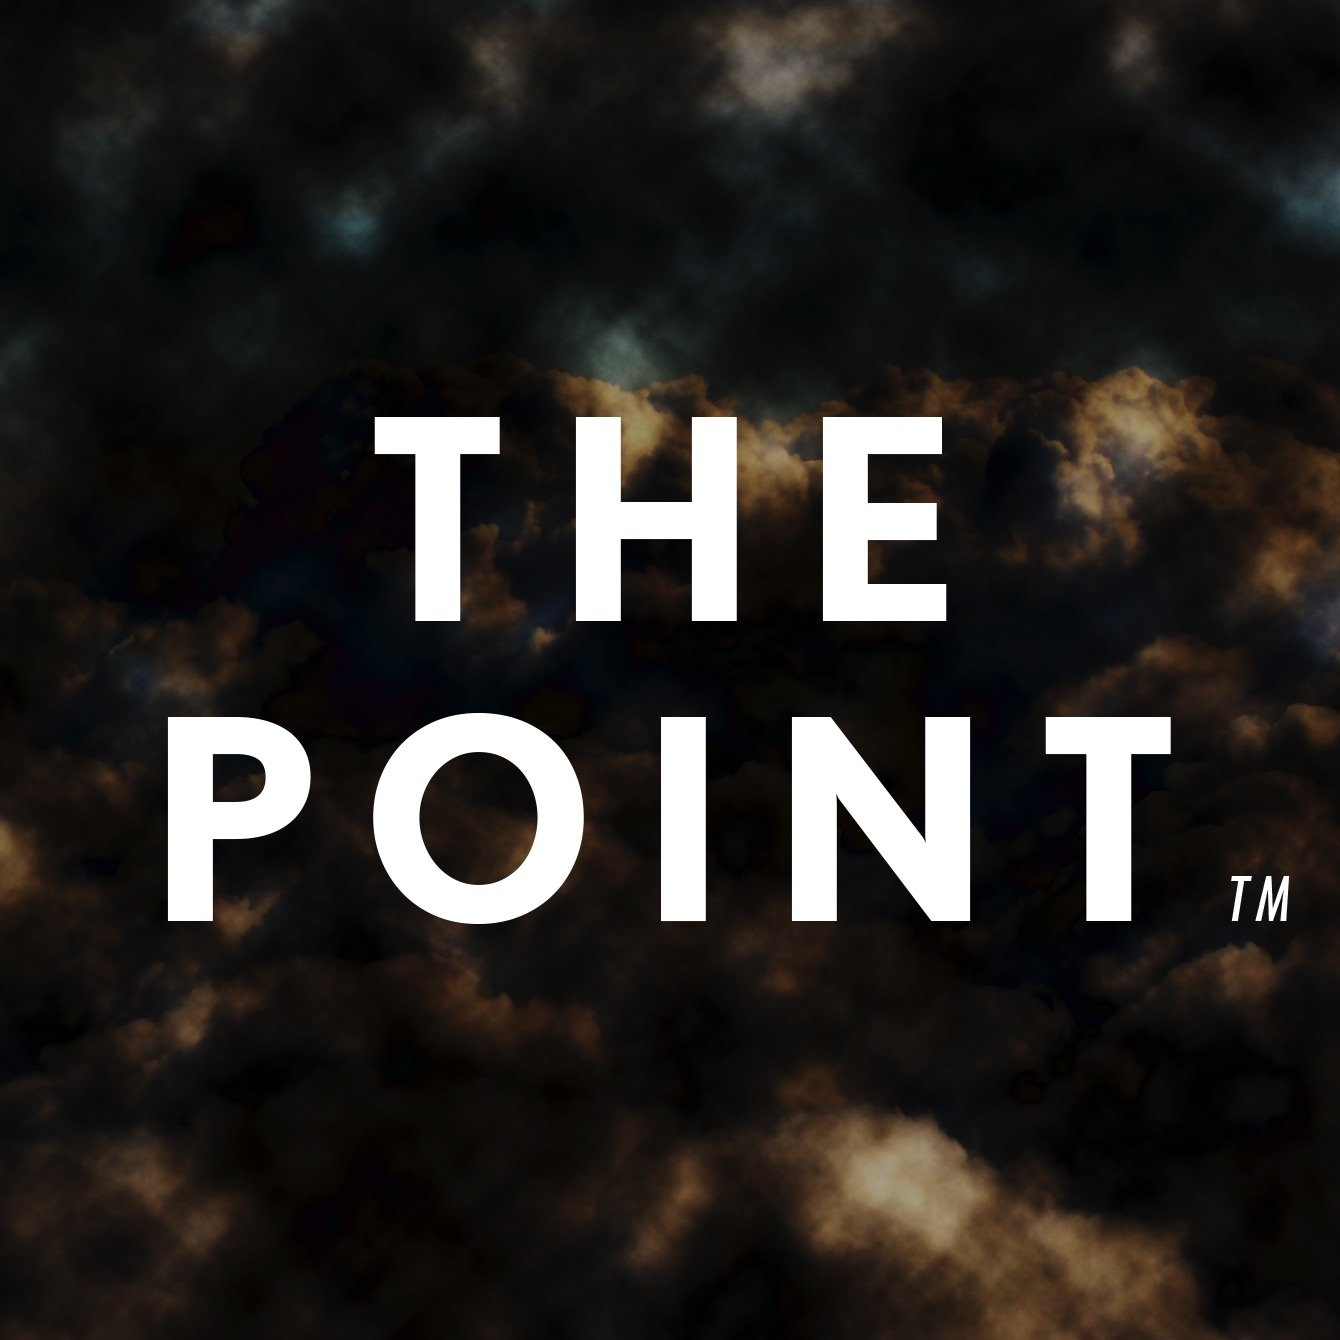 @thepointinc